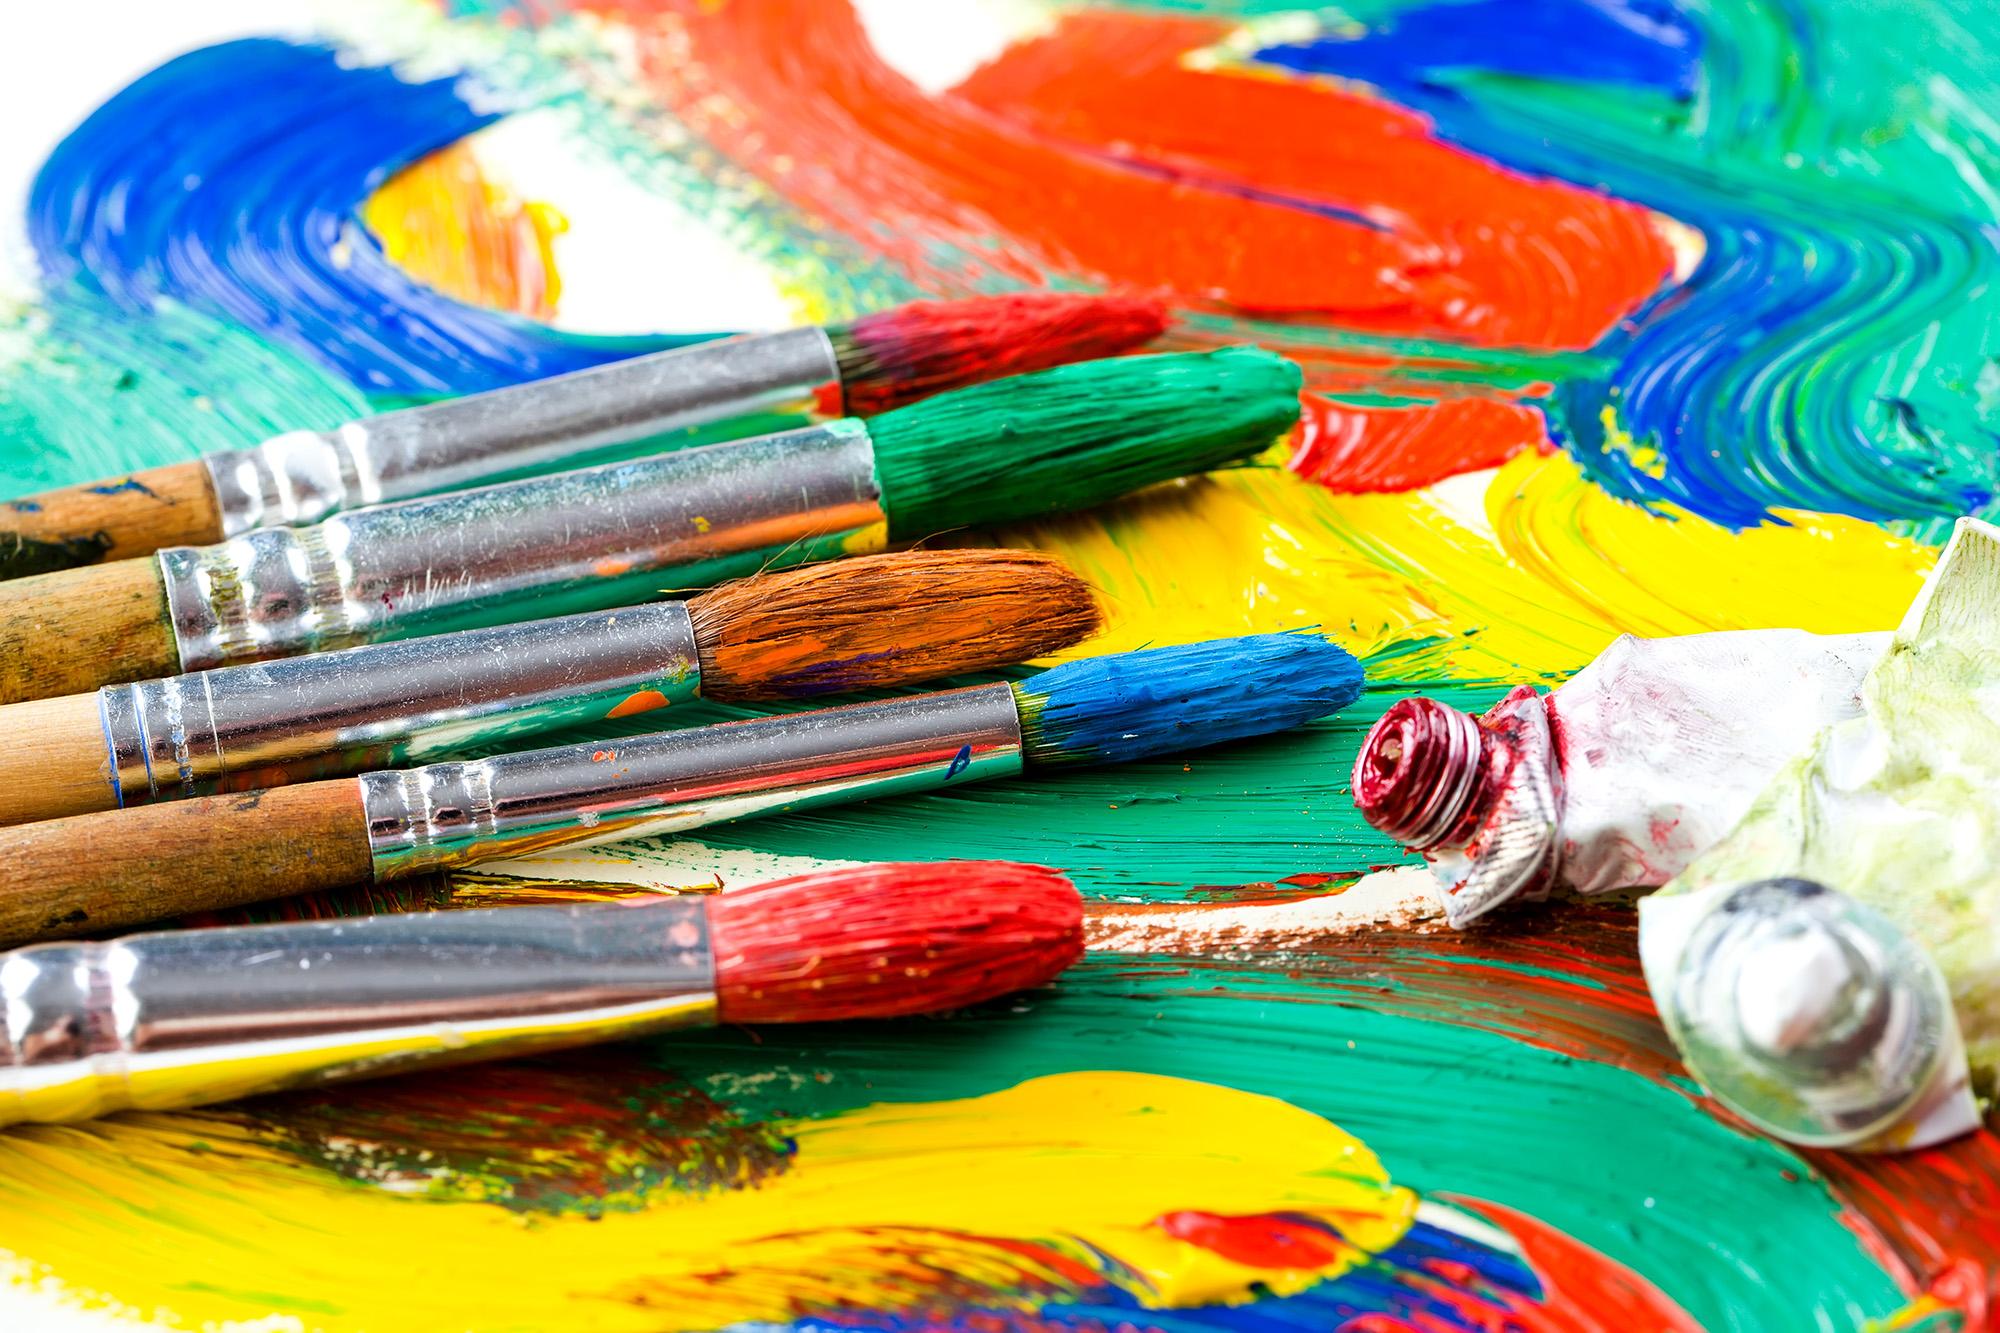 modern art gallery digital art ron labryzz